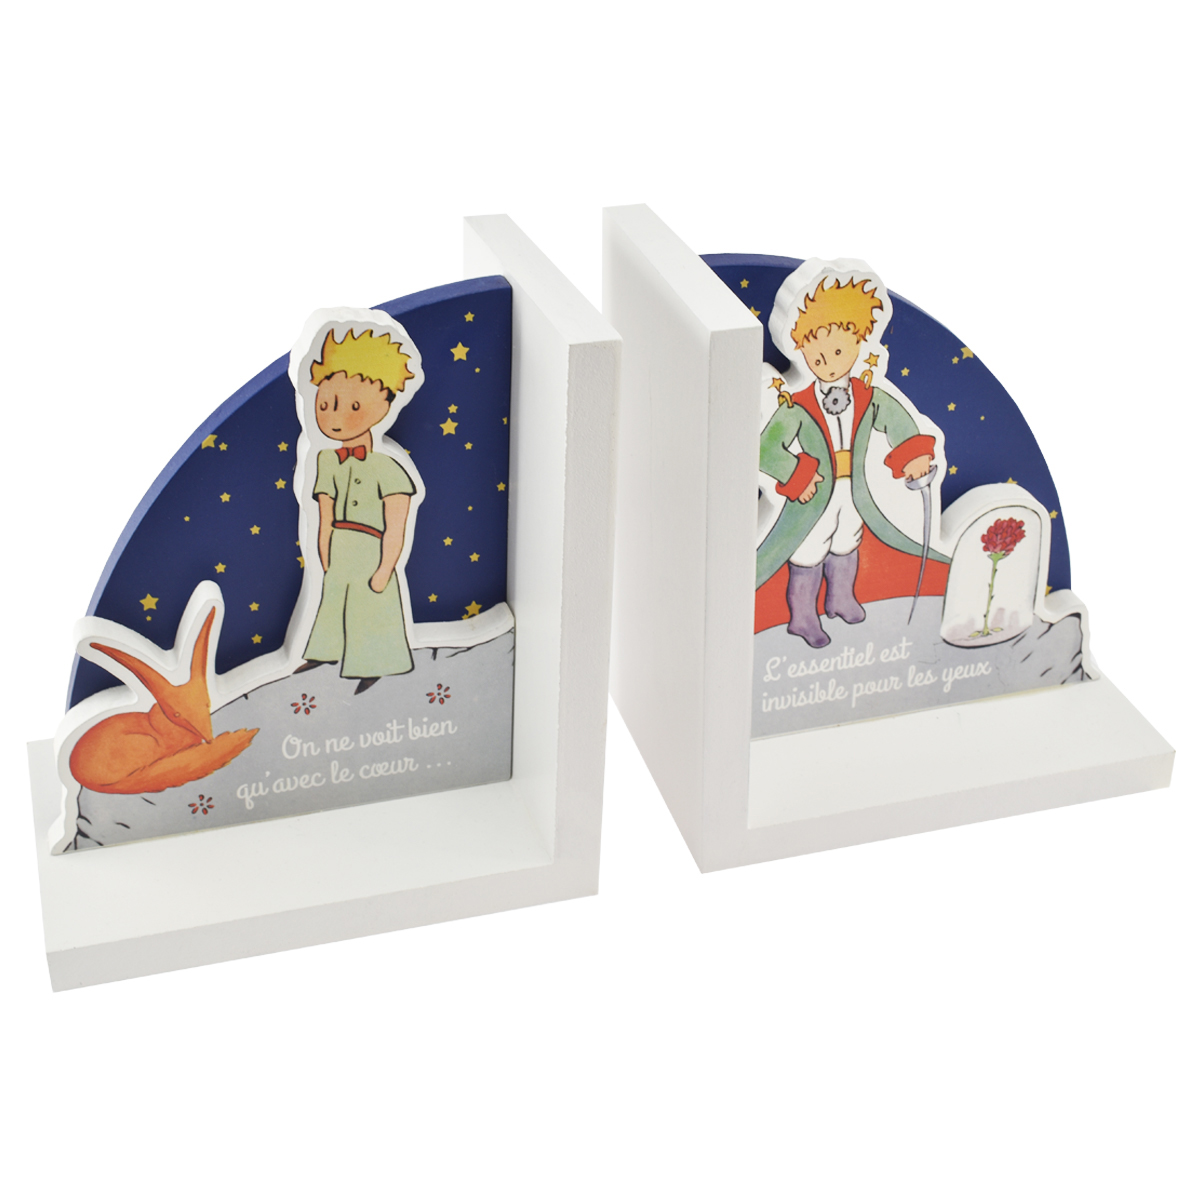 Serre-livres bois \'Le Petit Prince\' bleu blanc - chacun 15x135x9 cm - [Q8322]